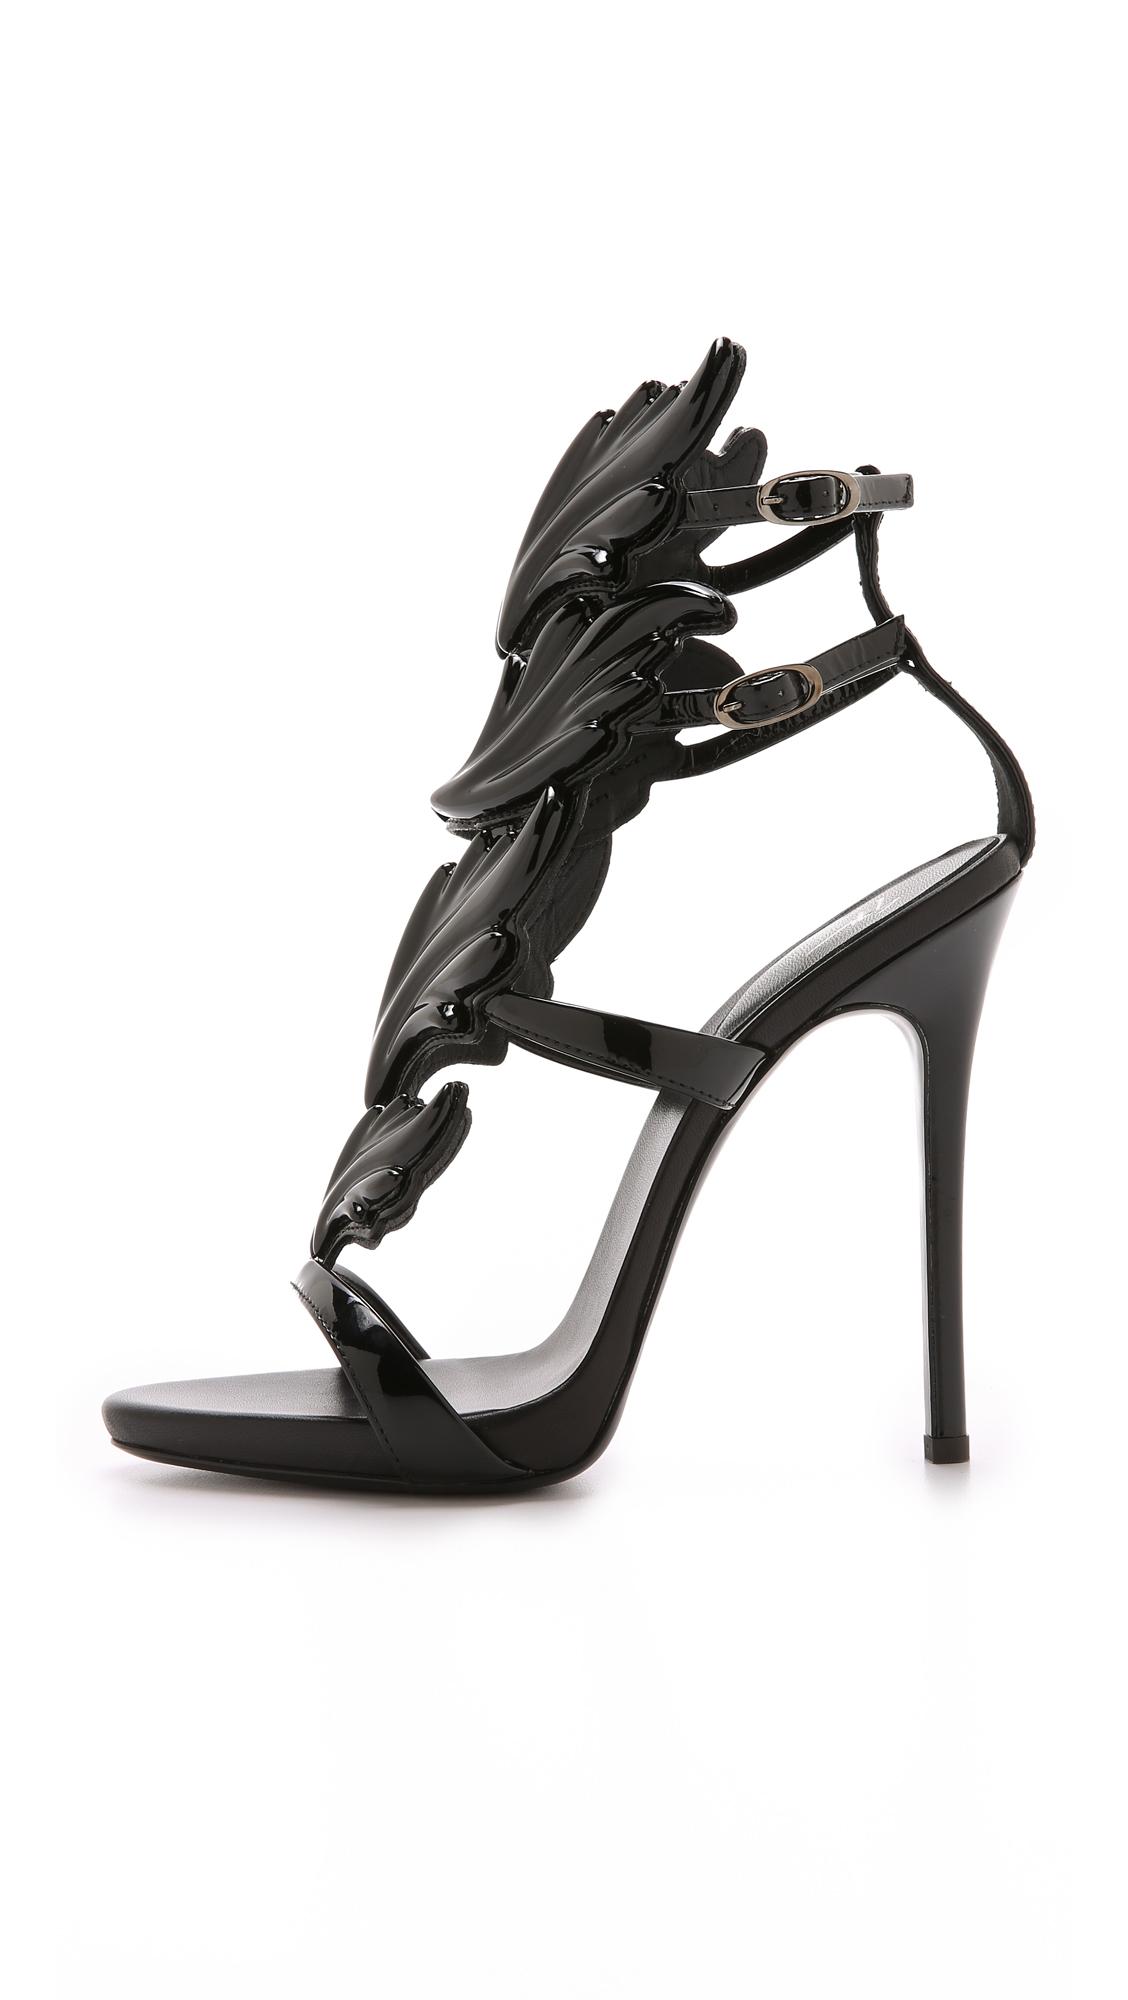 451af7e889139 Giuseppe Zanotti Metal Wing Sandals